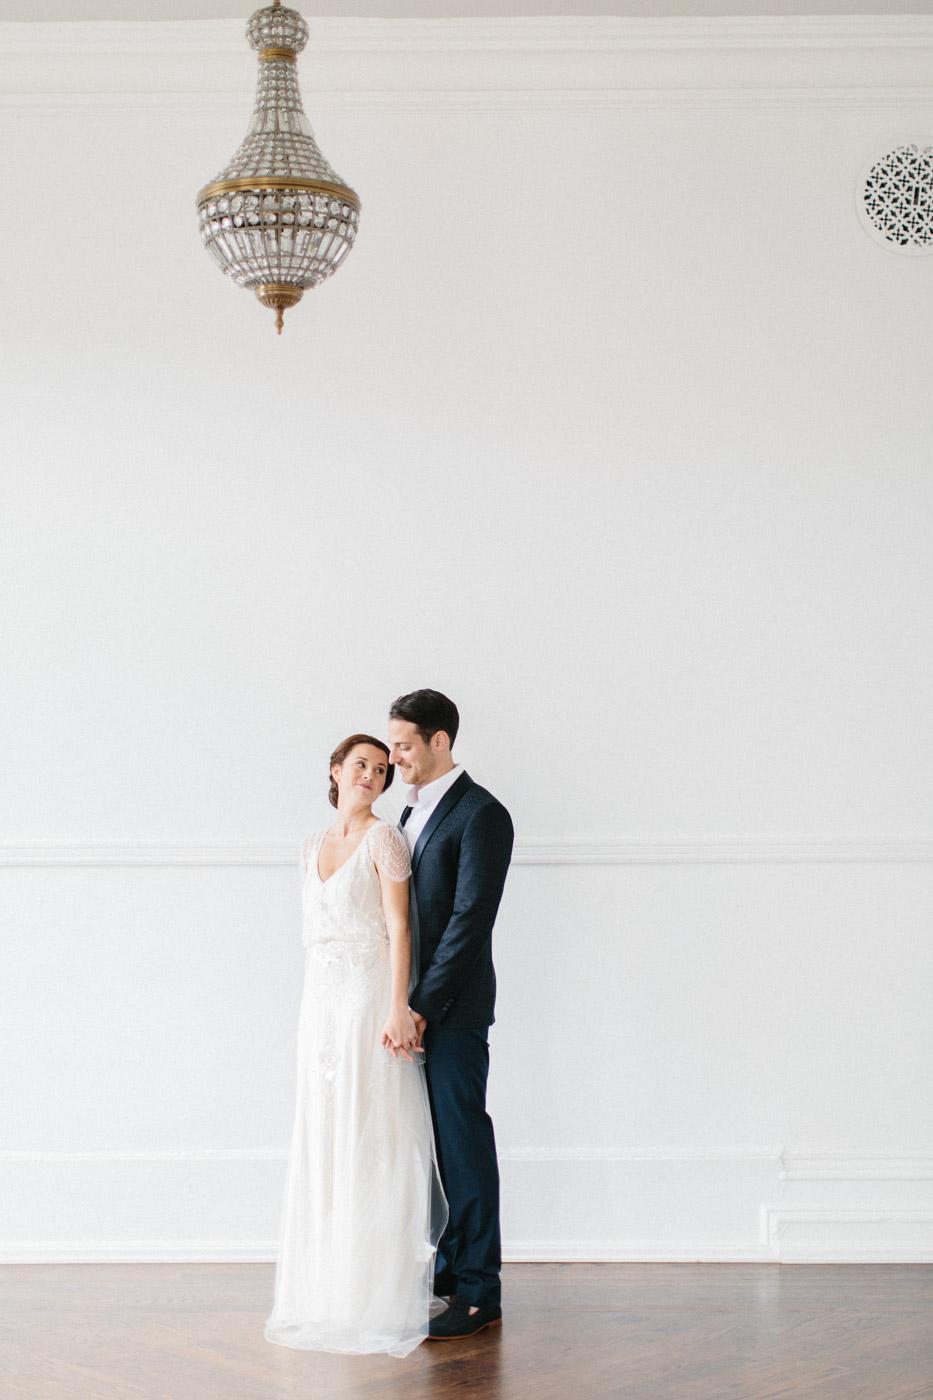 toronto_wedding_photographer_the_great_hall-38.jpg